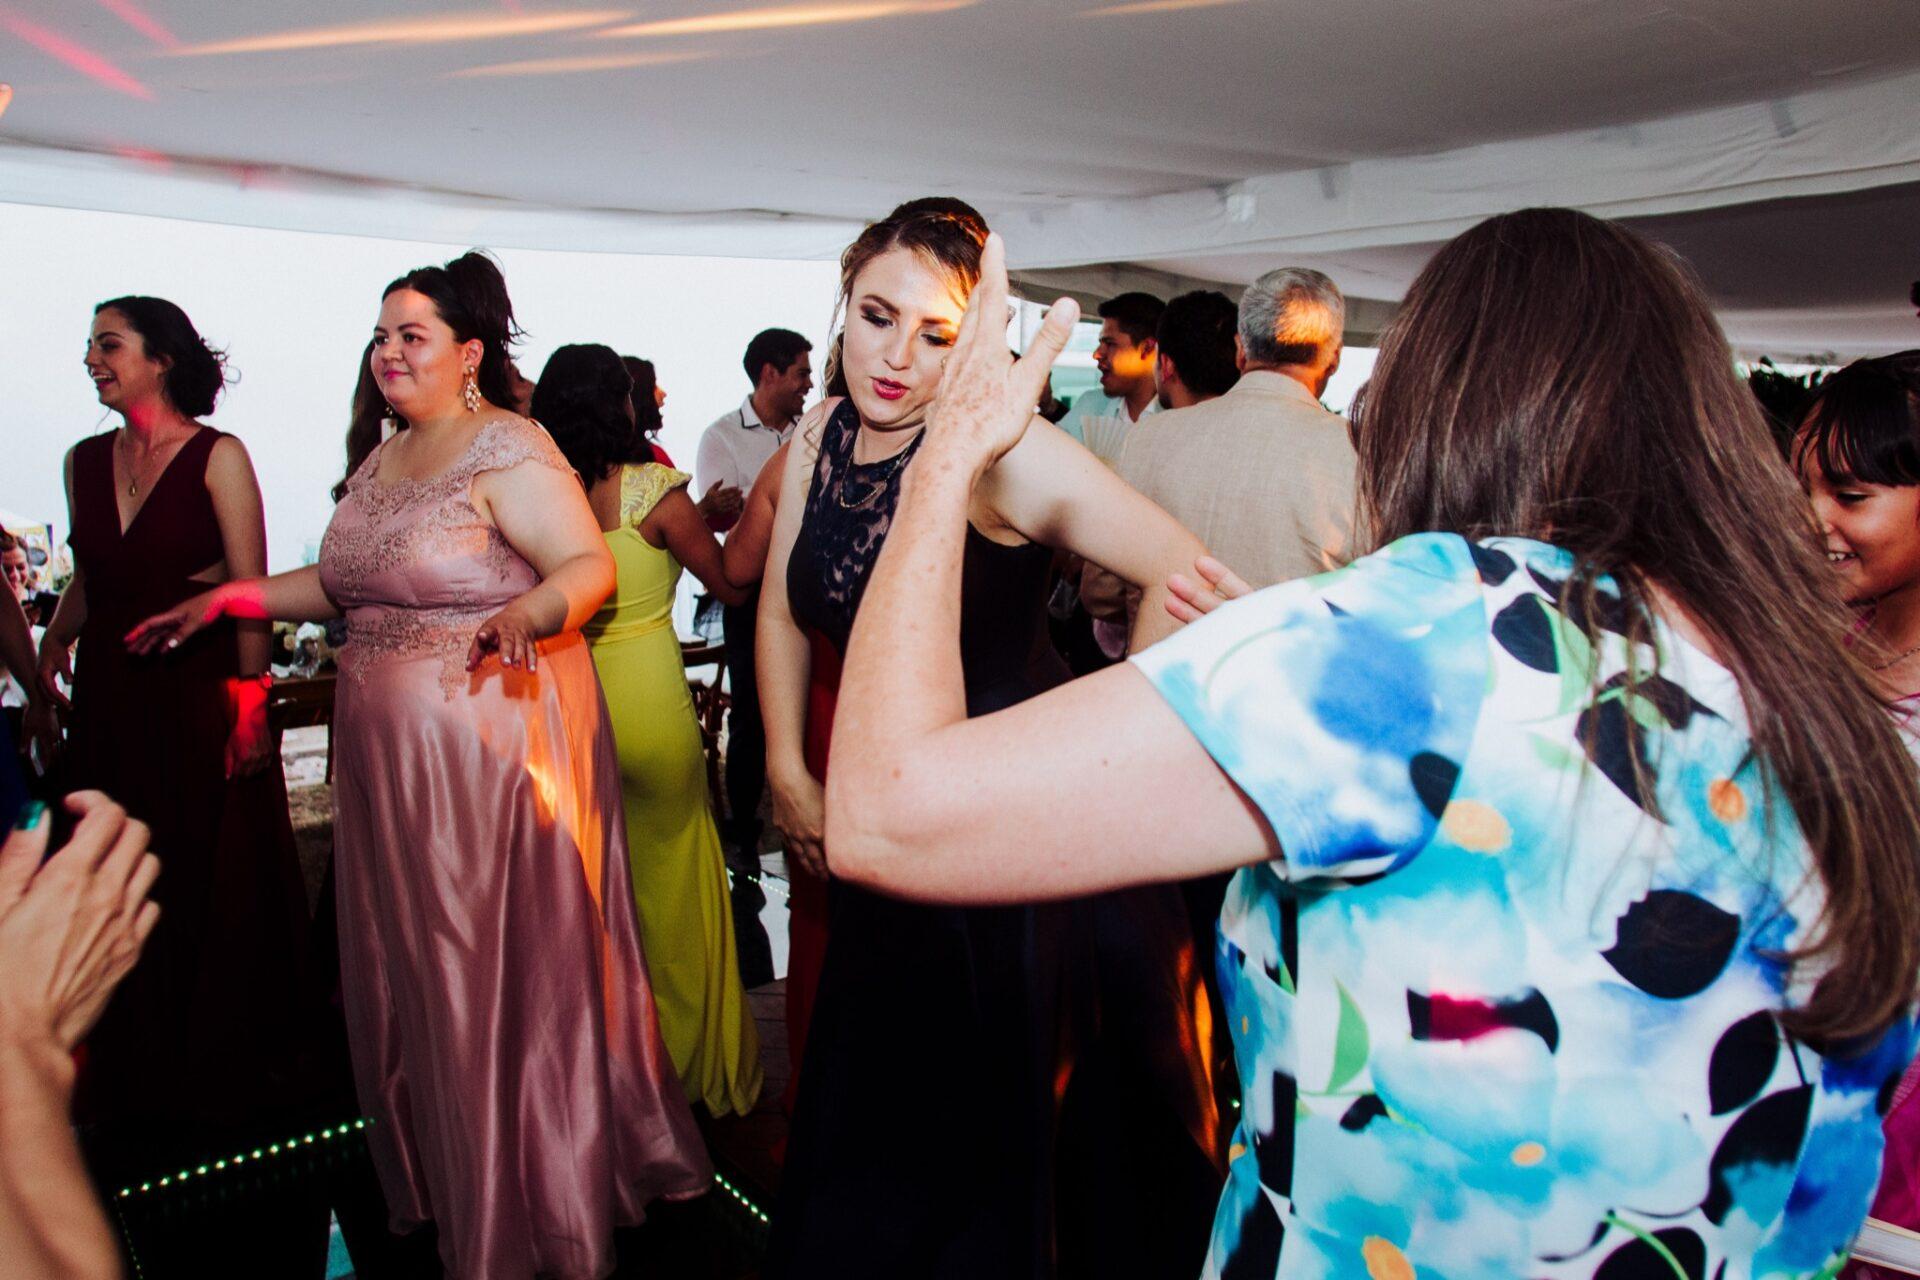 javier_noriega_fotografo_bodas_centro_platero_zacatecas_wedding_photographer38